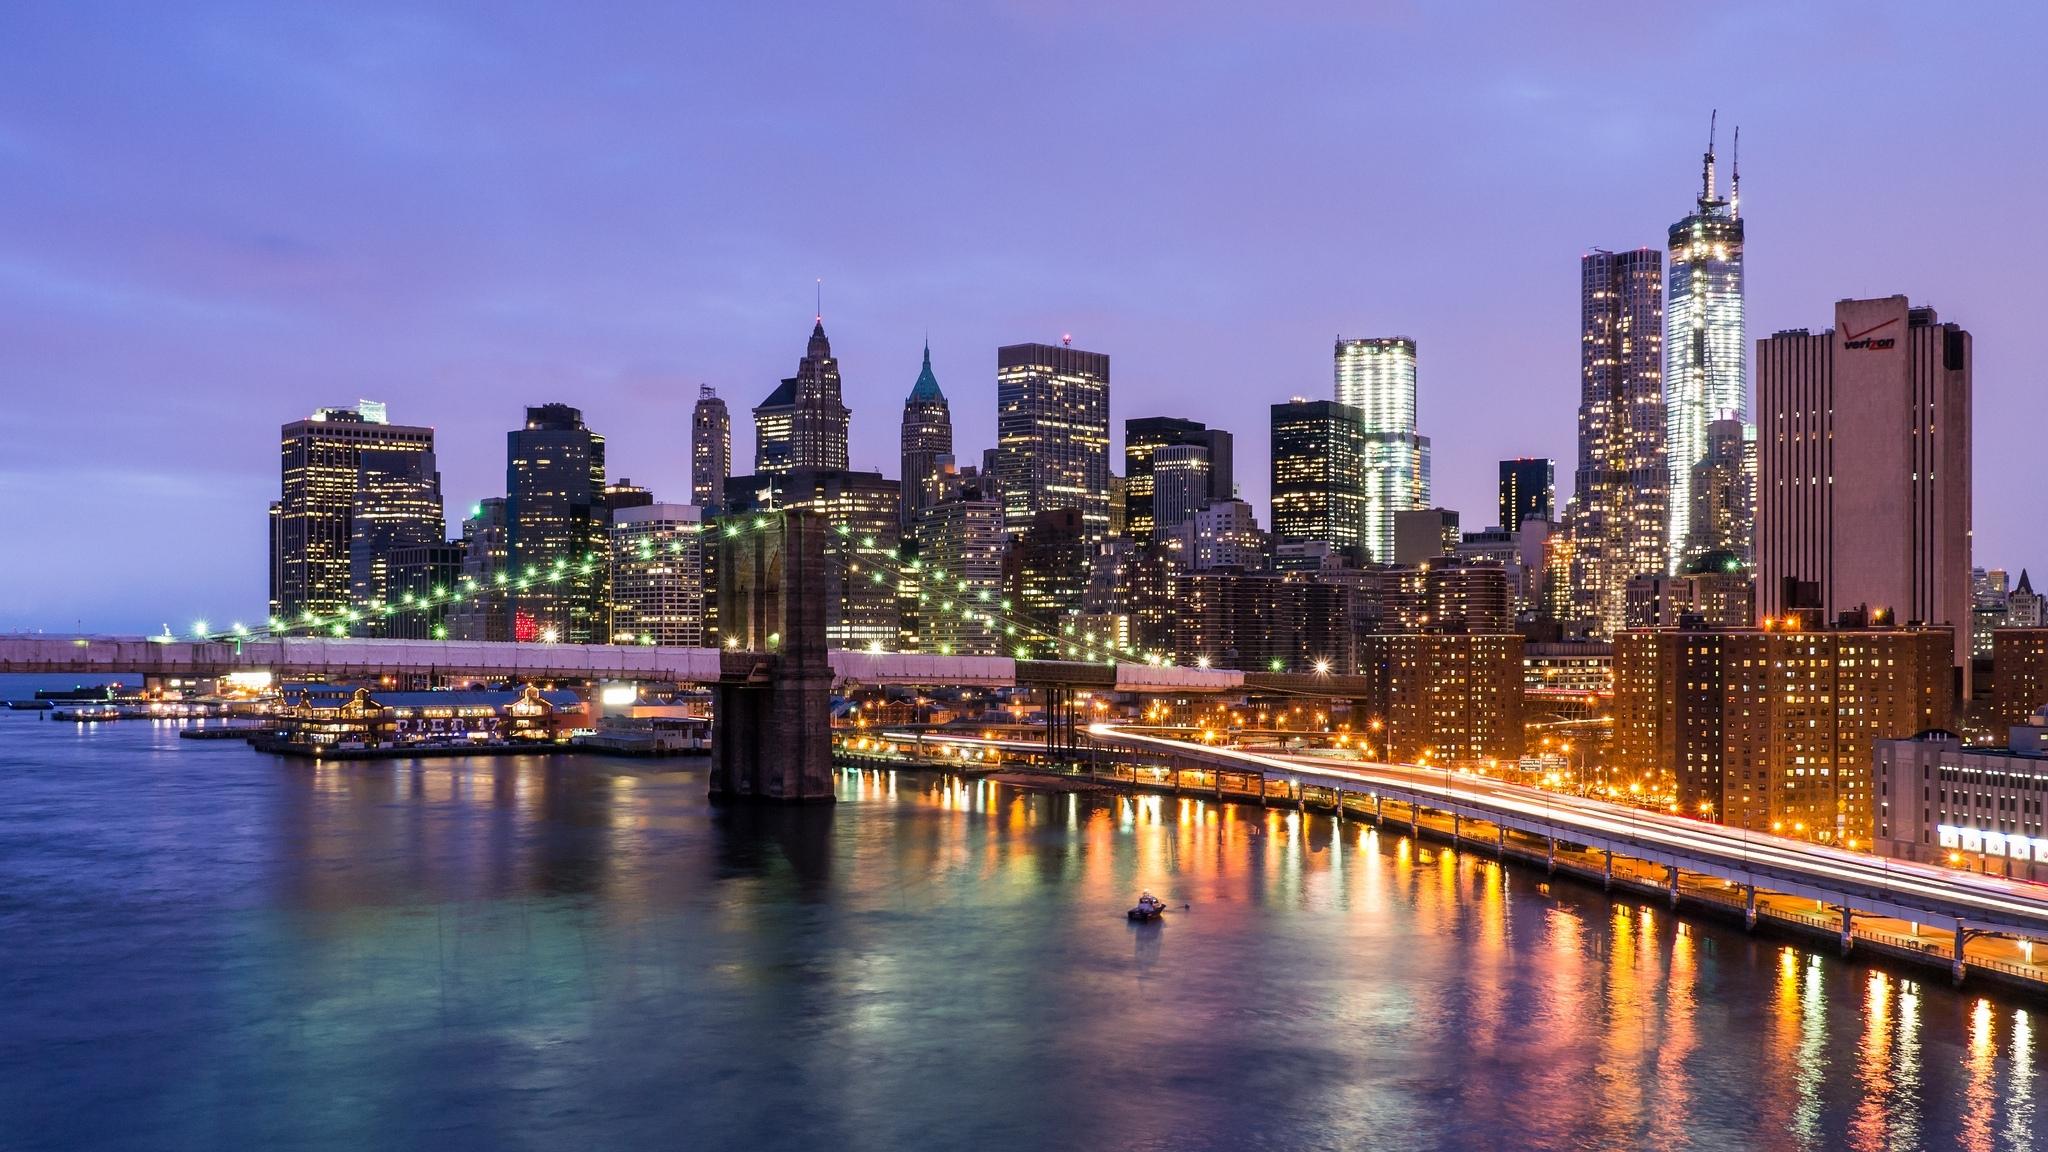 new york city desktop wallpaper hd #6981465